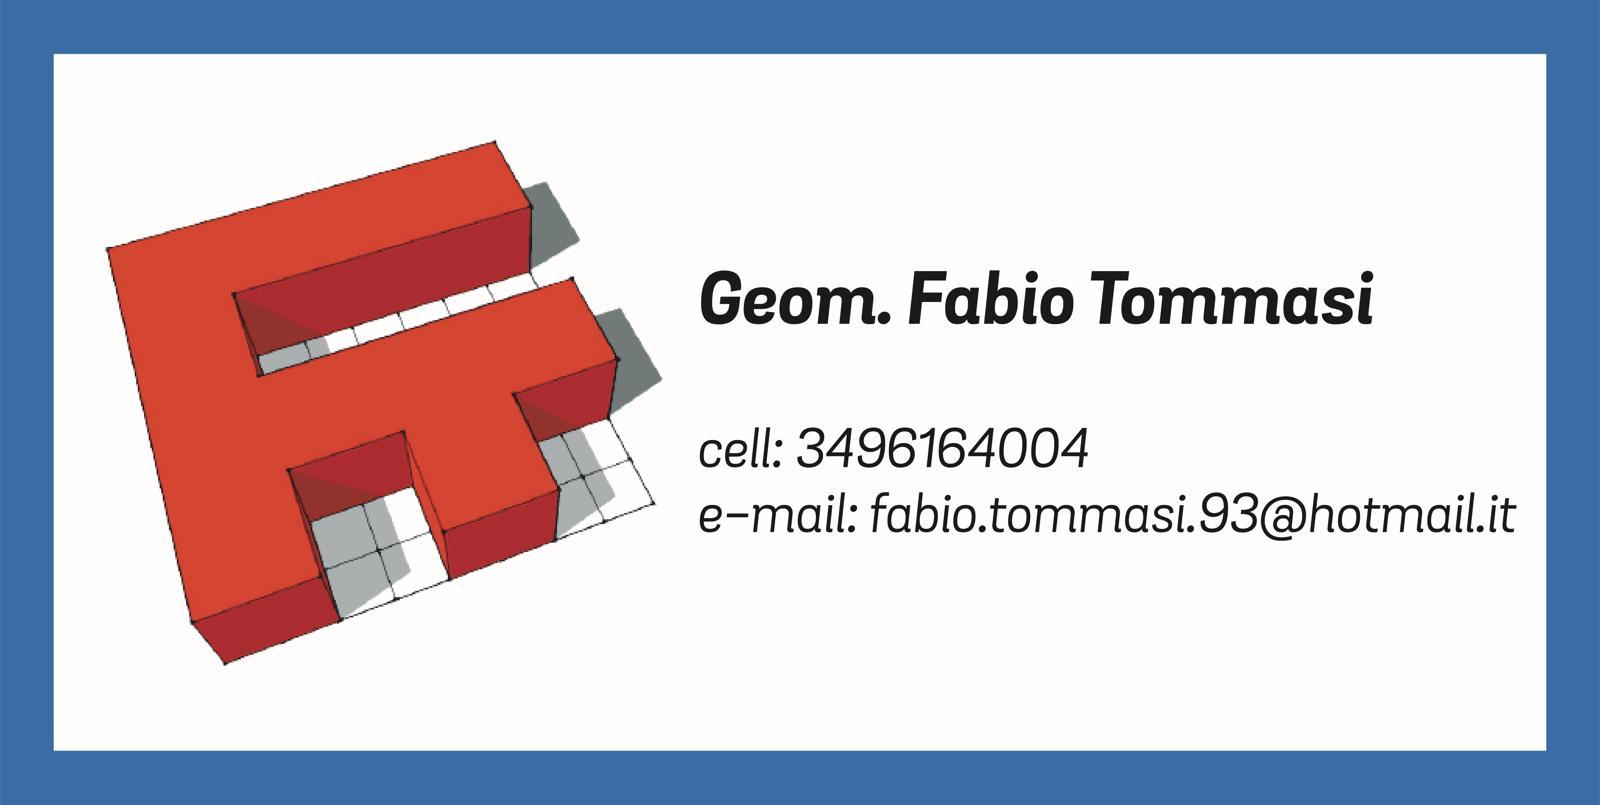 G. Fabio Tommasi